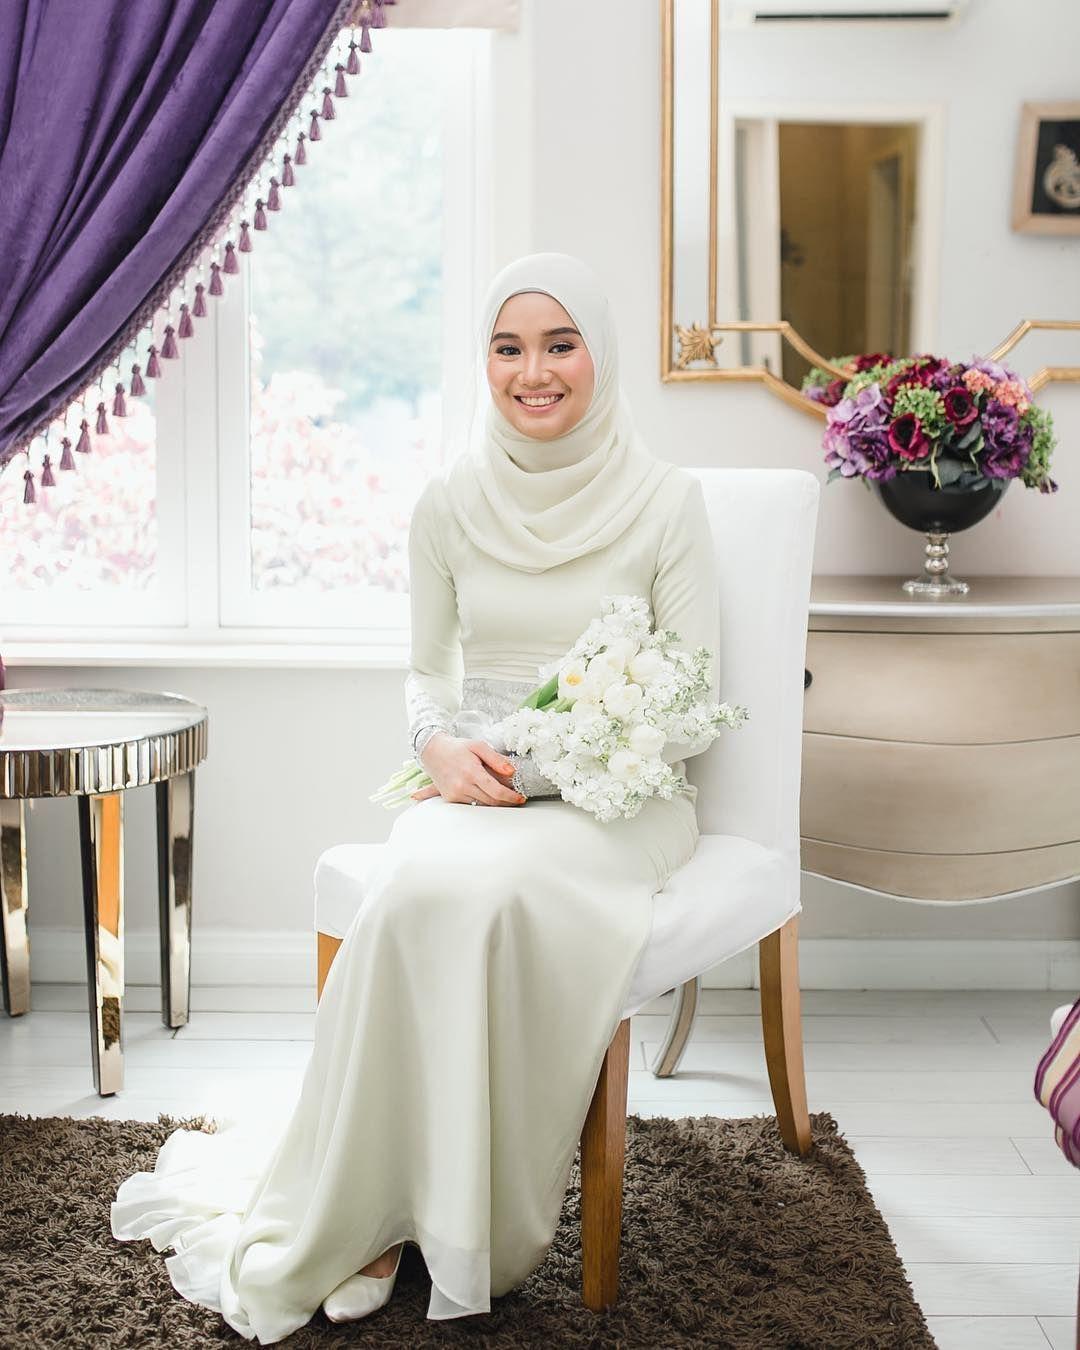 Pin By Lelushka Hijab Accessories On Hijab Wedding Style Nikah Dress Wedding Dress Long Sleeve Muslim Wedding Dresses [ 1350 x 1080 Pixel ]